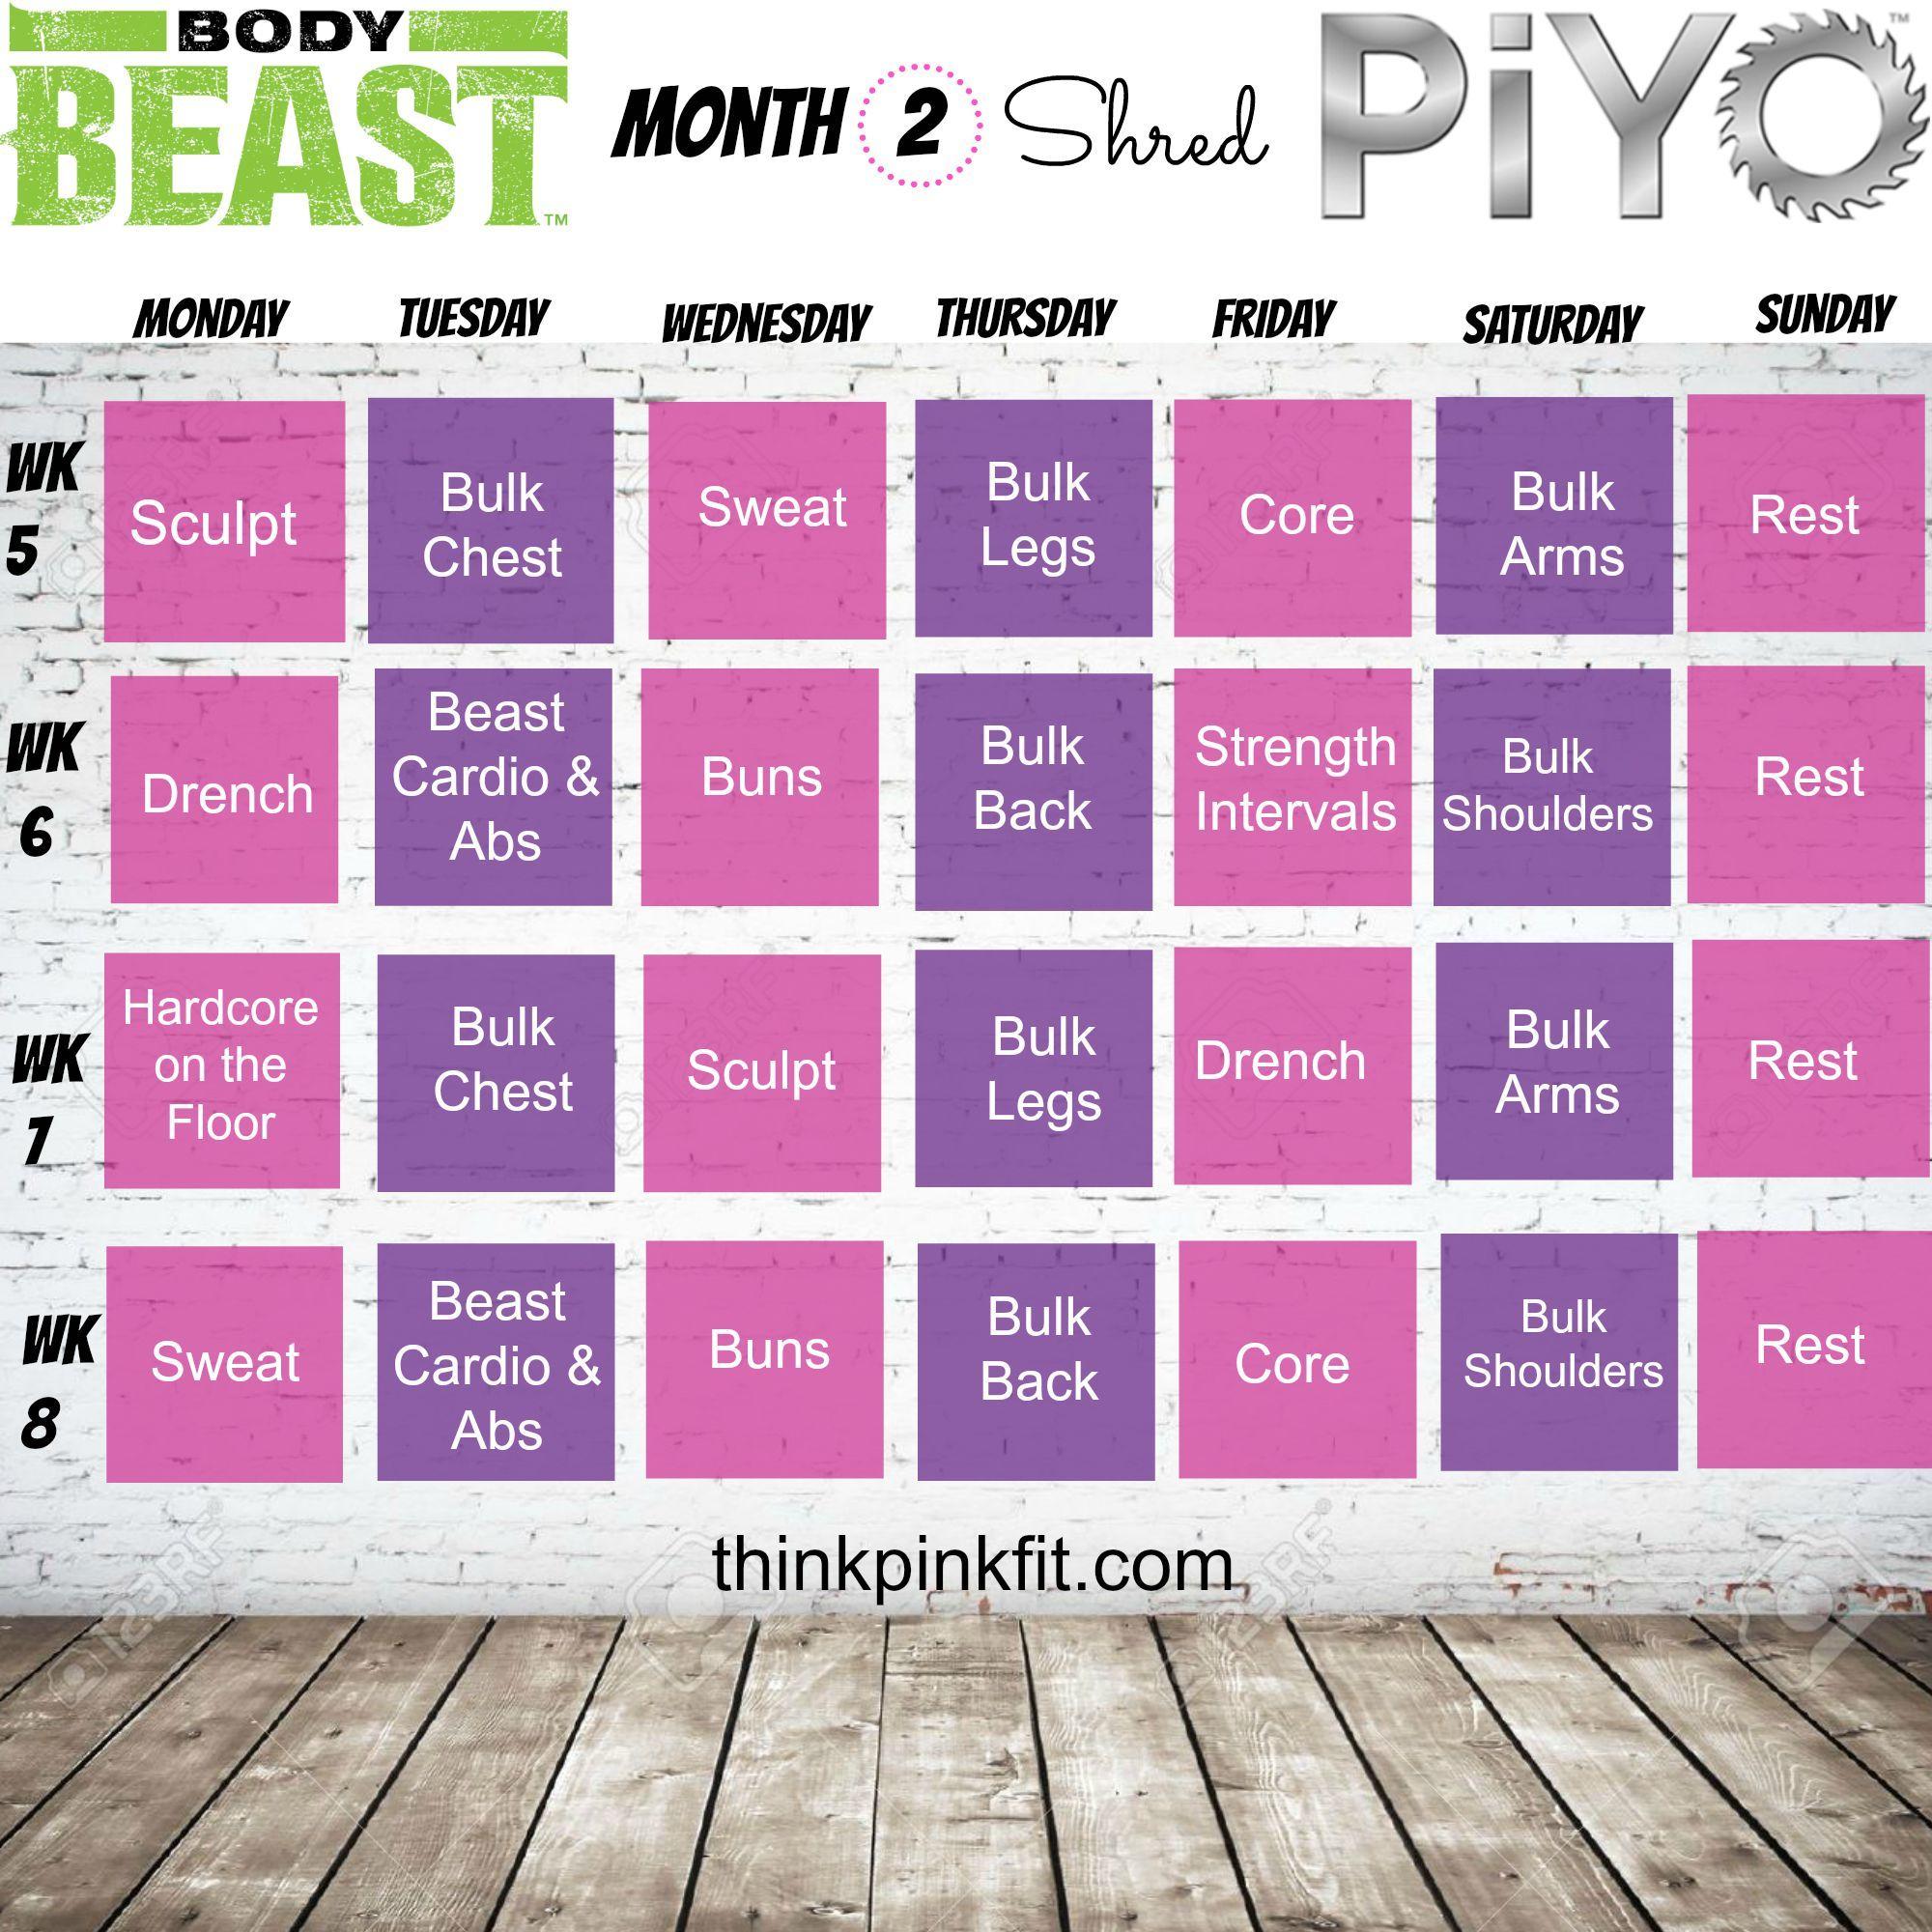 Body Beast & Piyo Hybrid Schedule For Strength And with regard to Piyo Calendar Printable